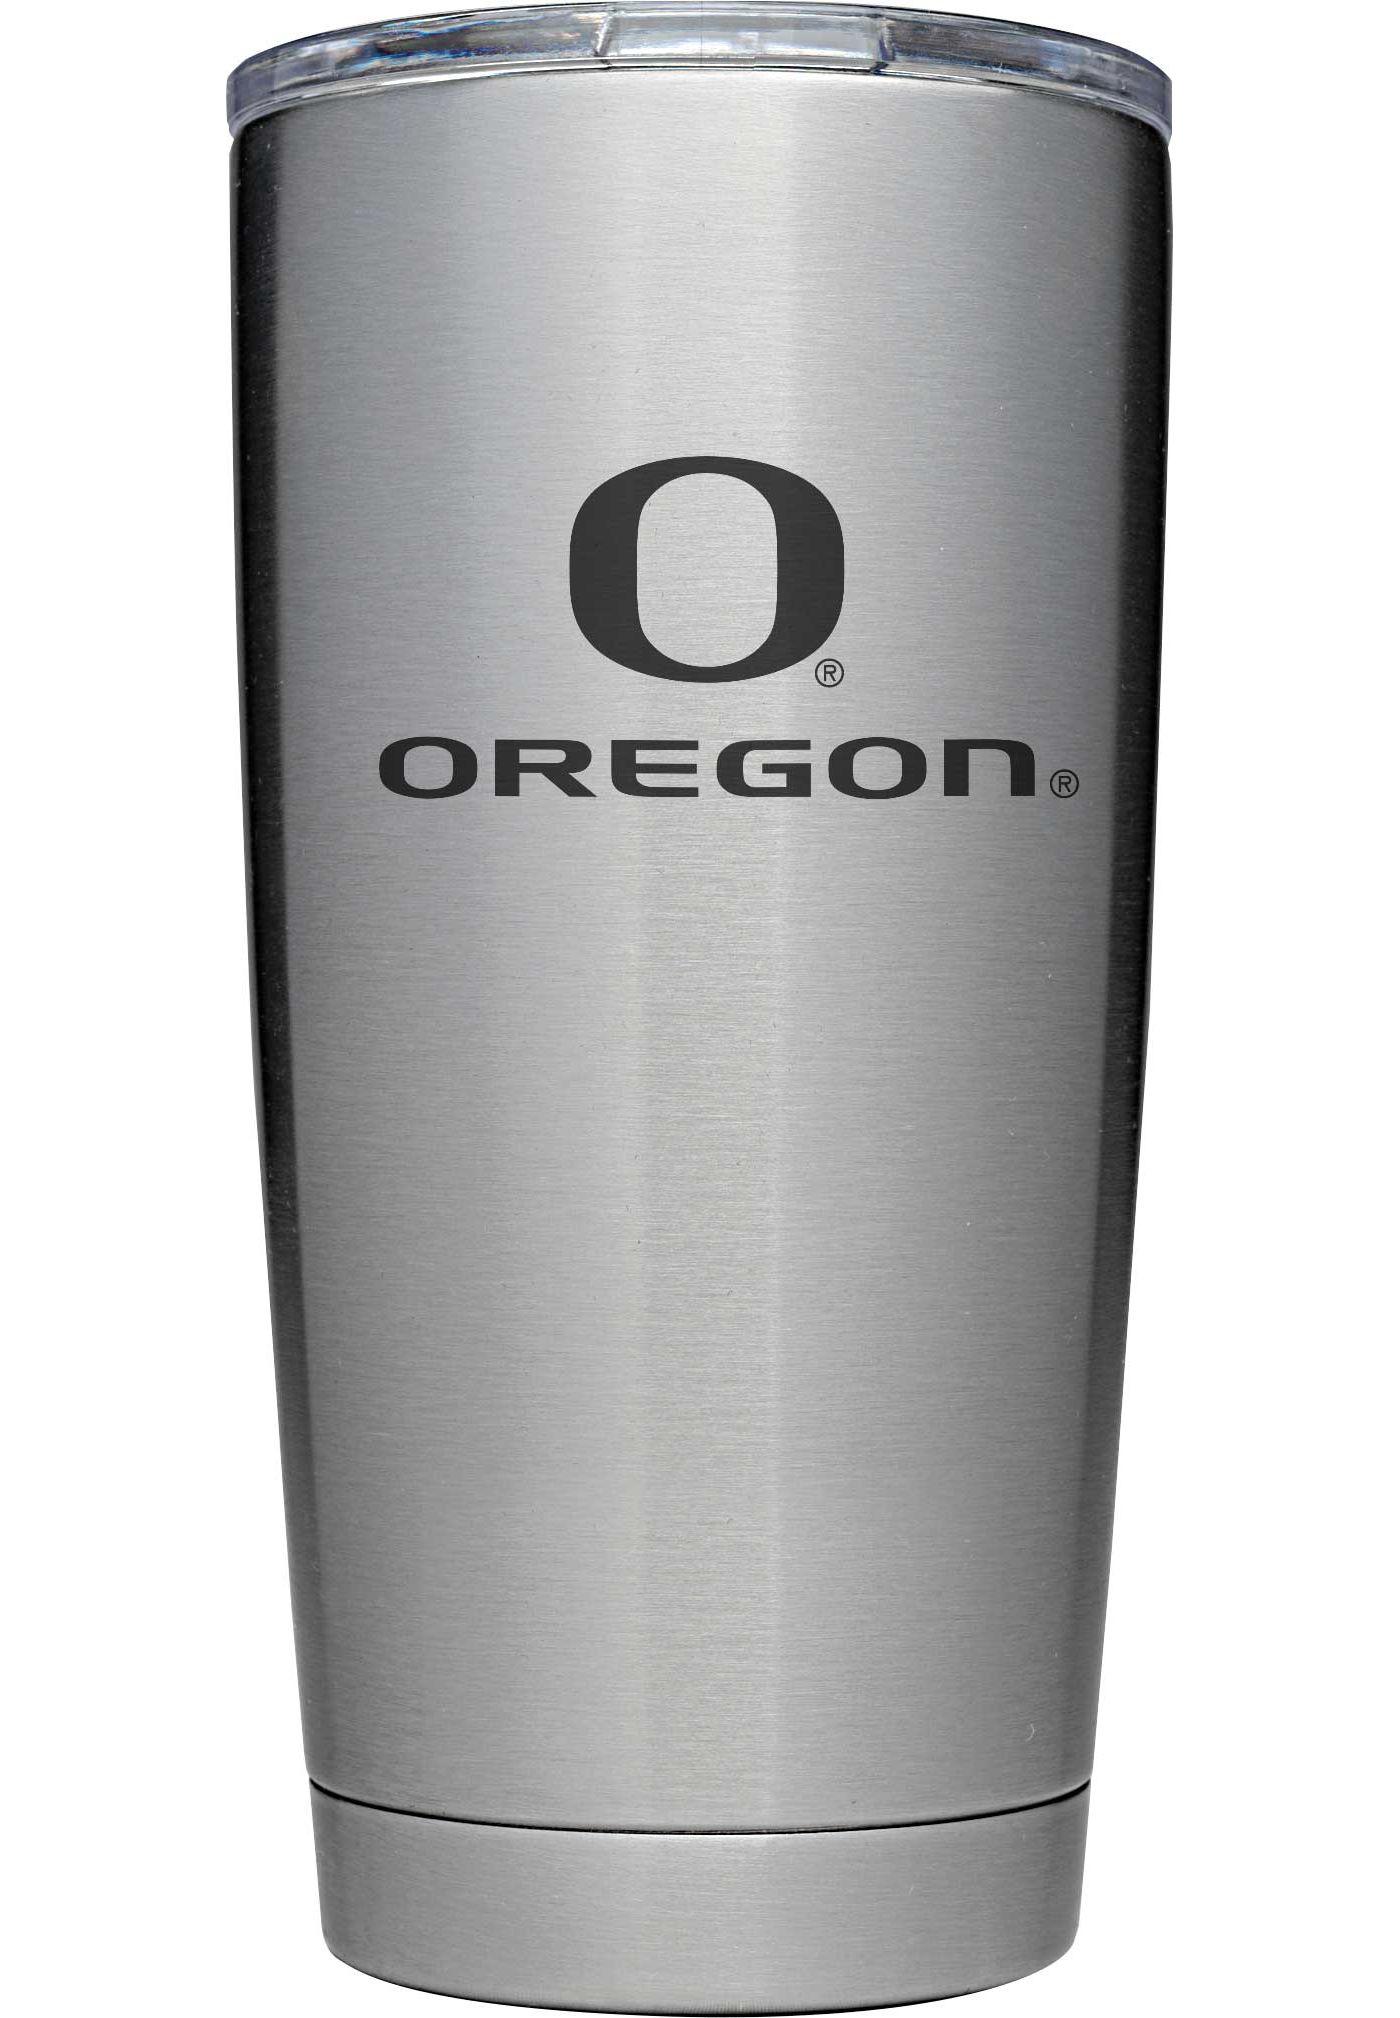 YETI Oregon Ducks 20 oz. Rambler Tumbler Cup